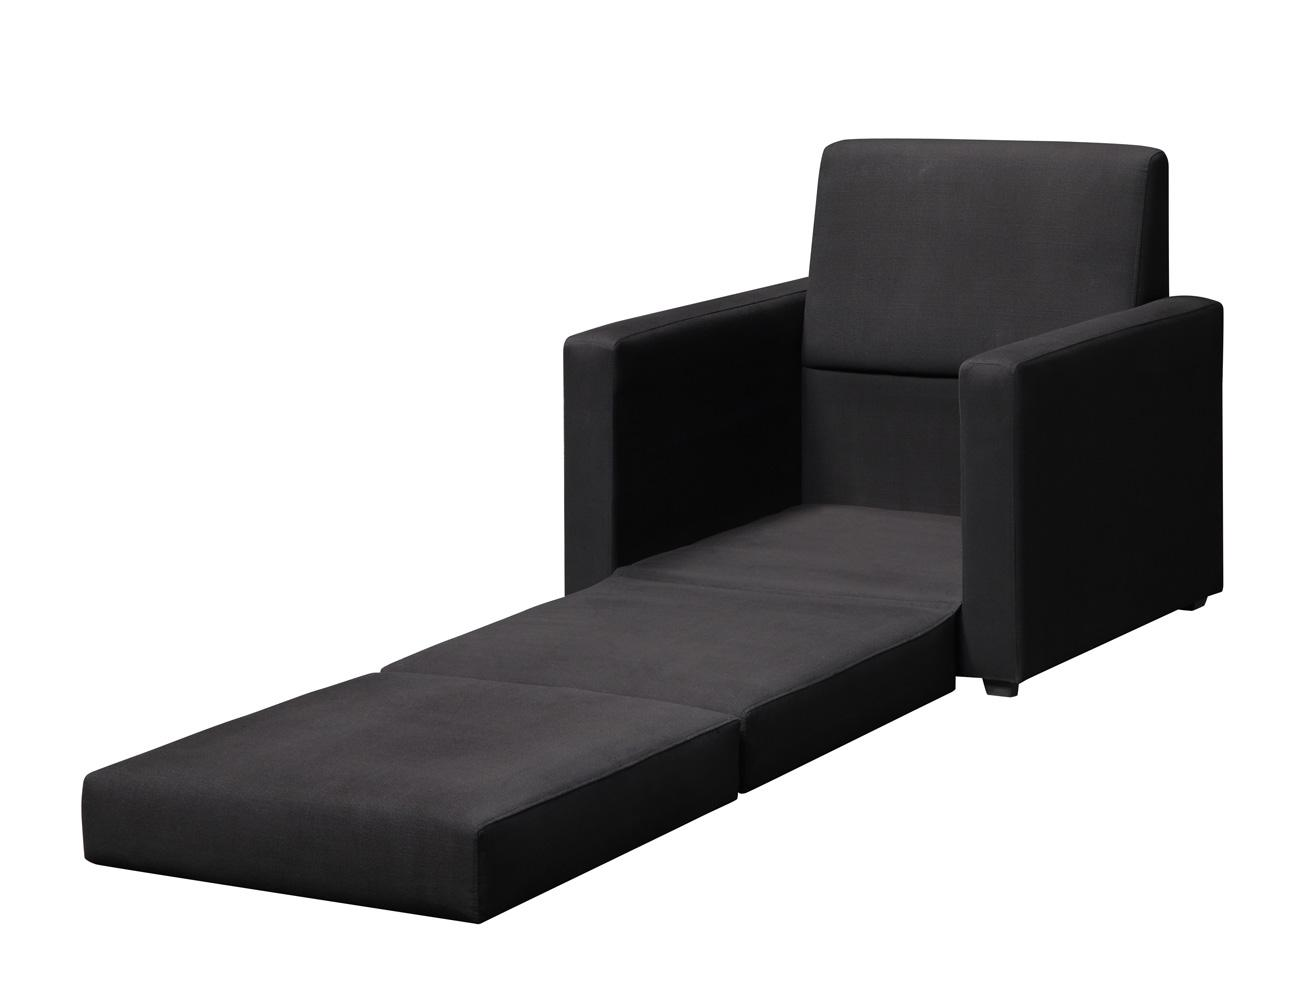 Single Sleeper Chair Home Decor